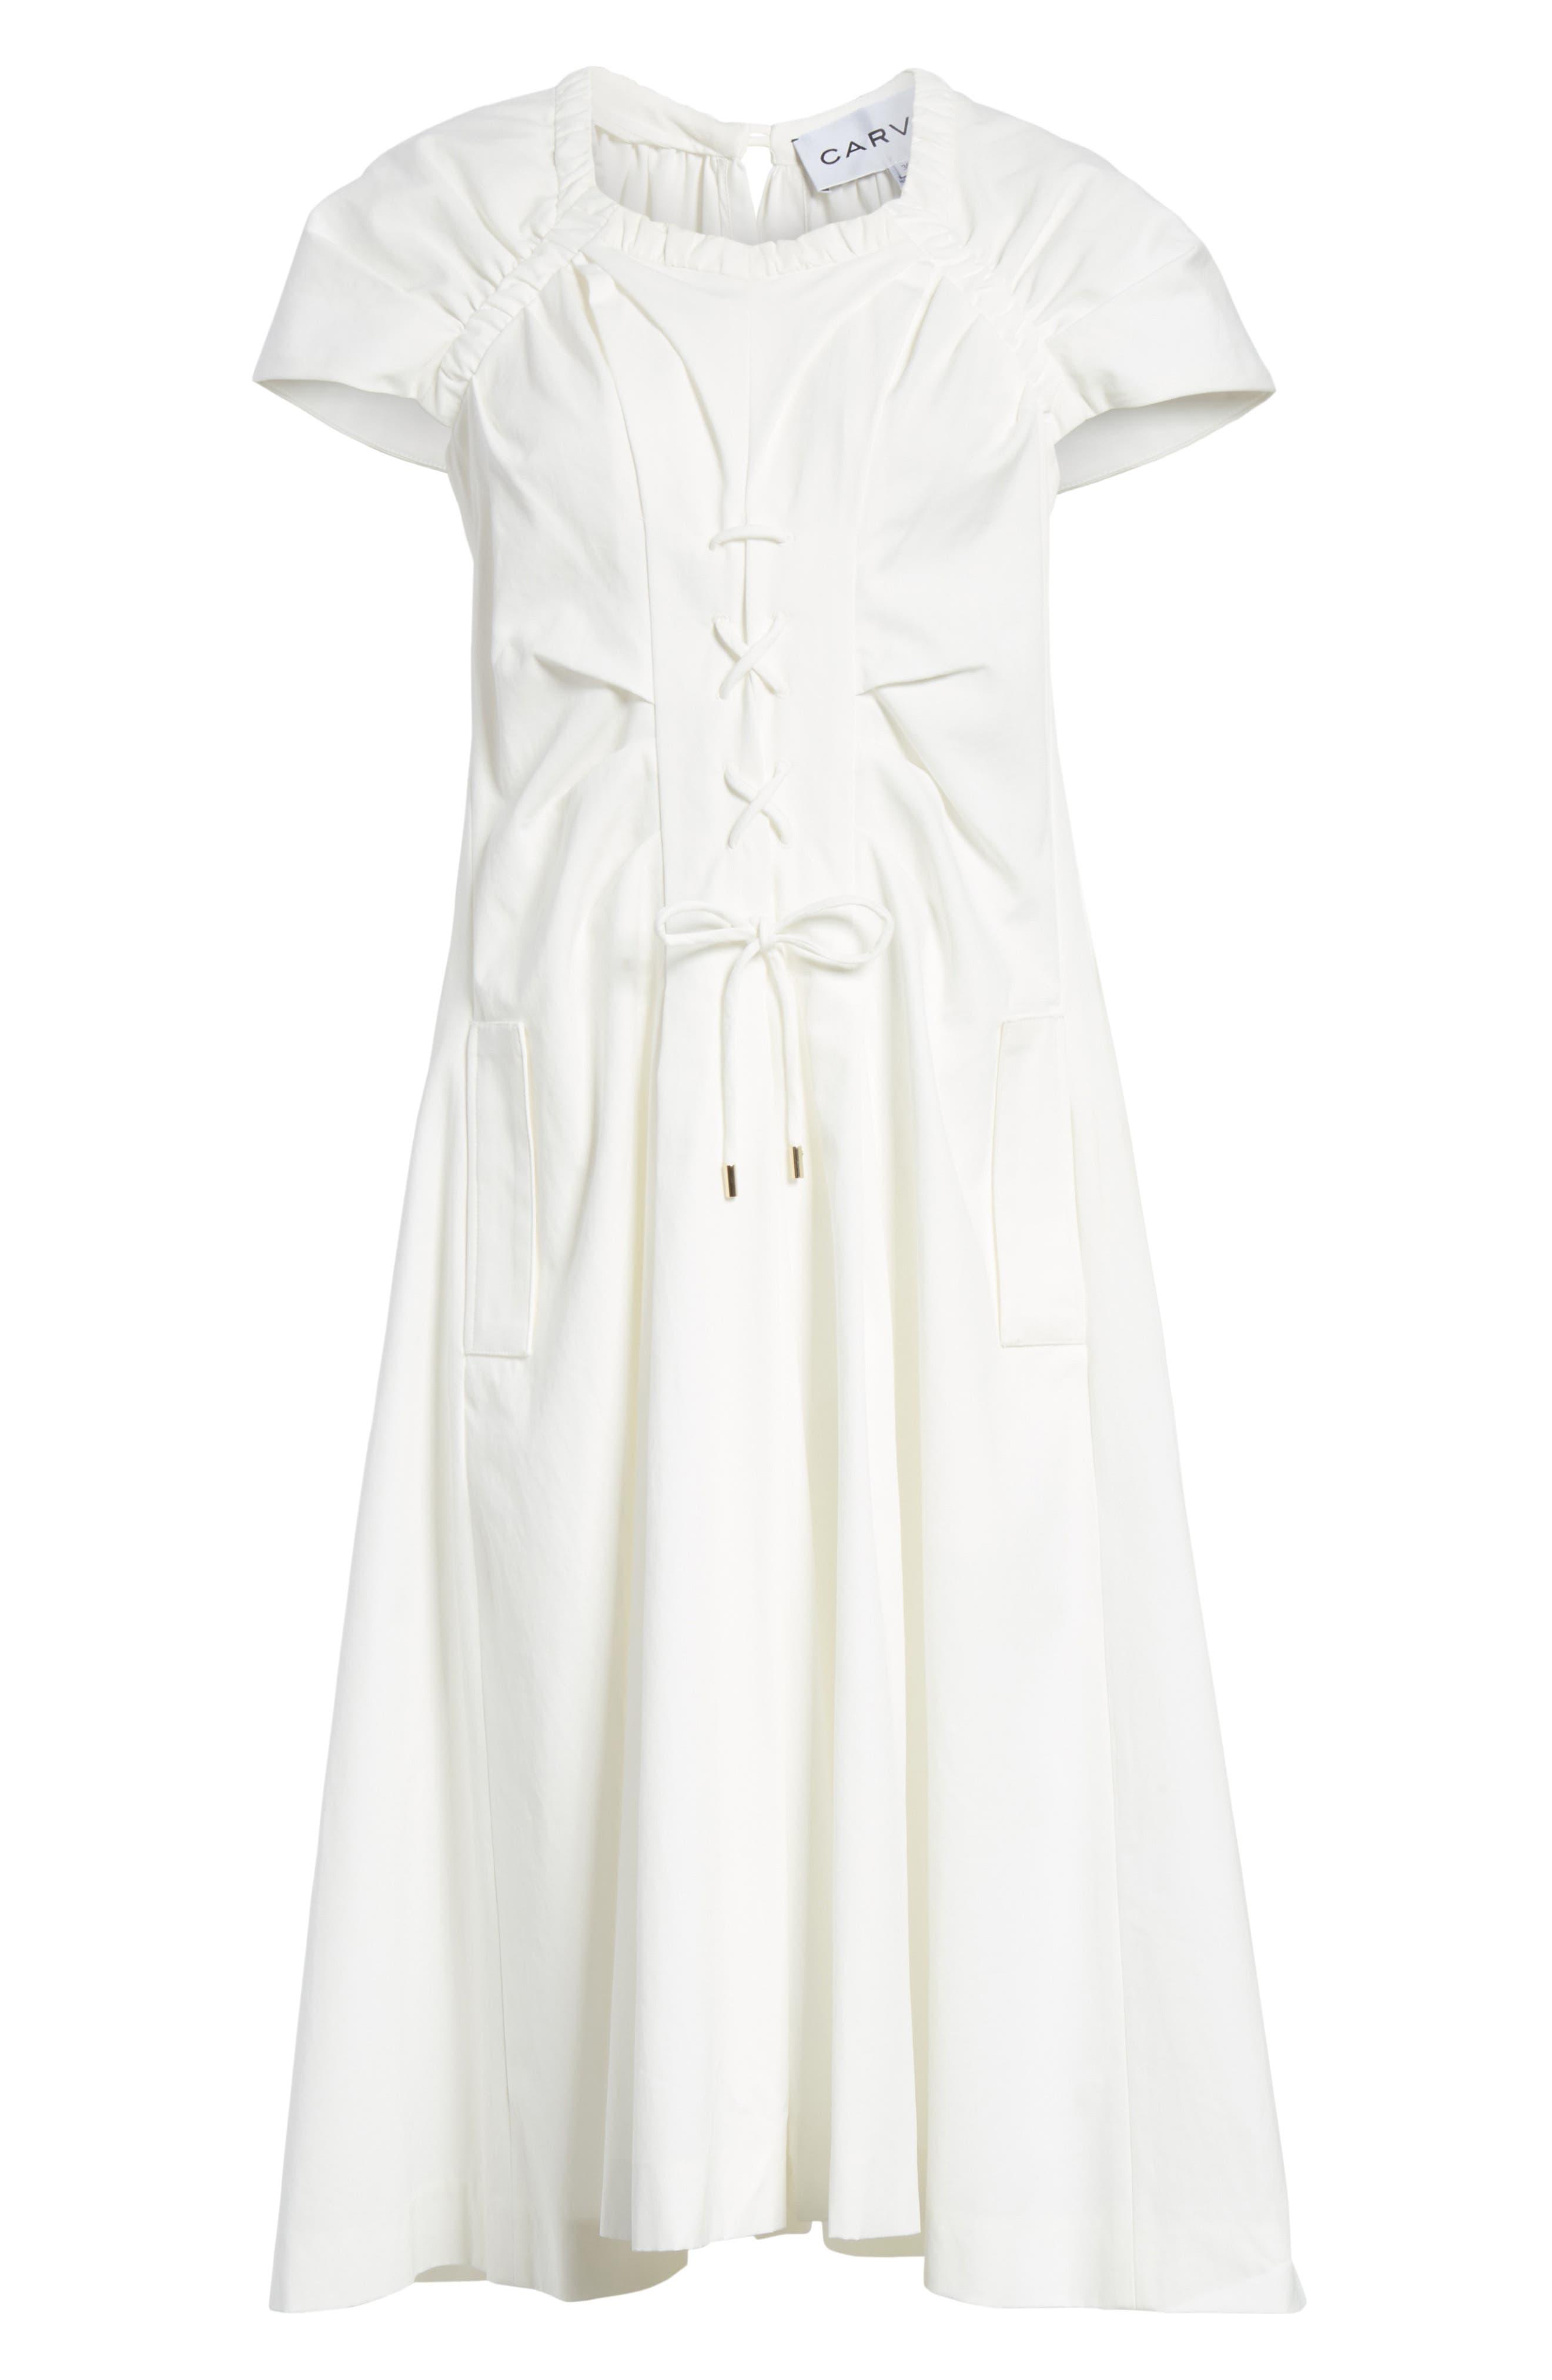 Lace Up Front Poplin Dress,                             Alternate thumbnail 6, color,                             100